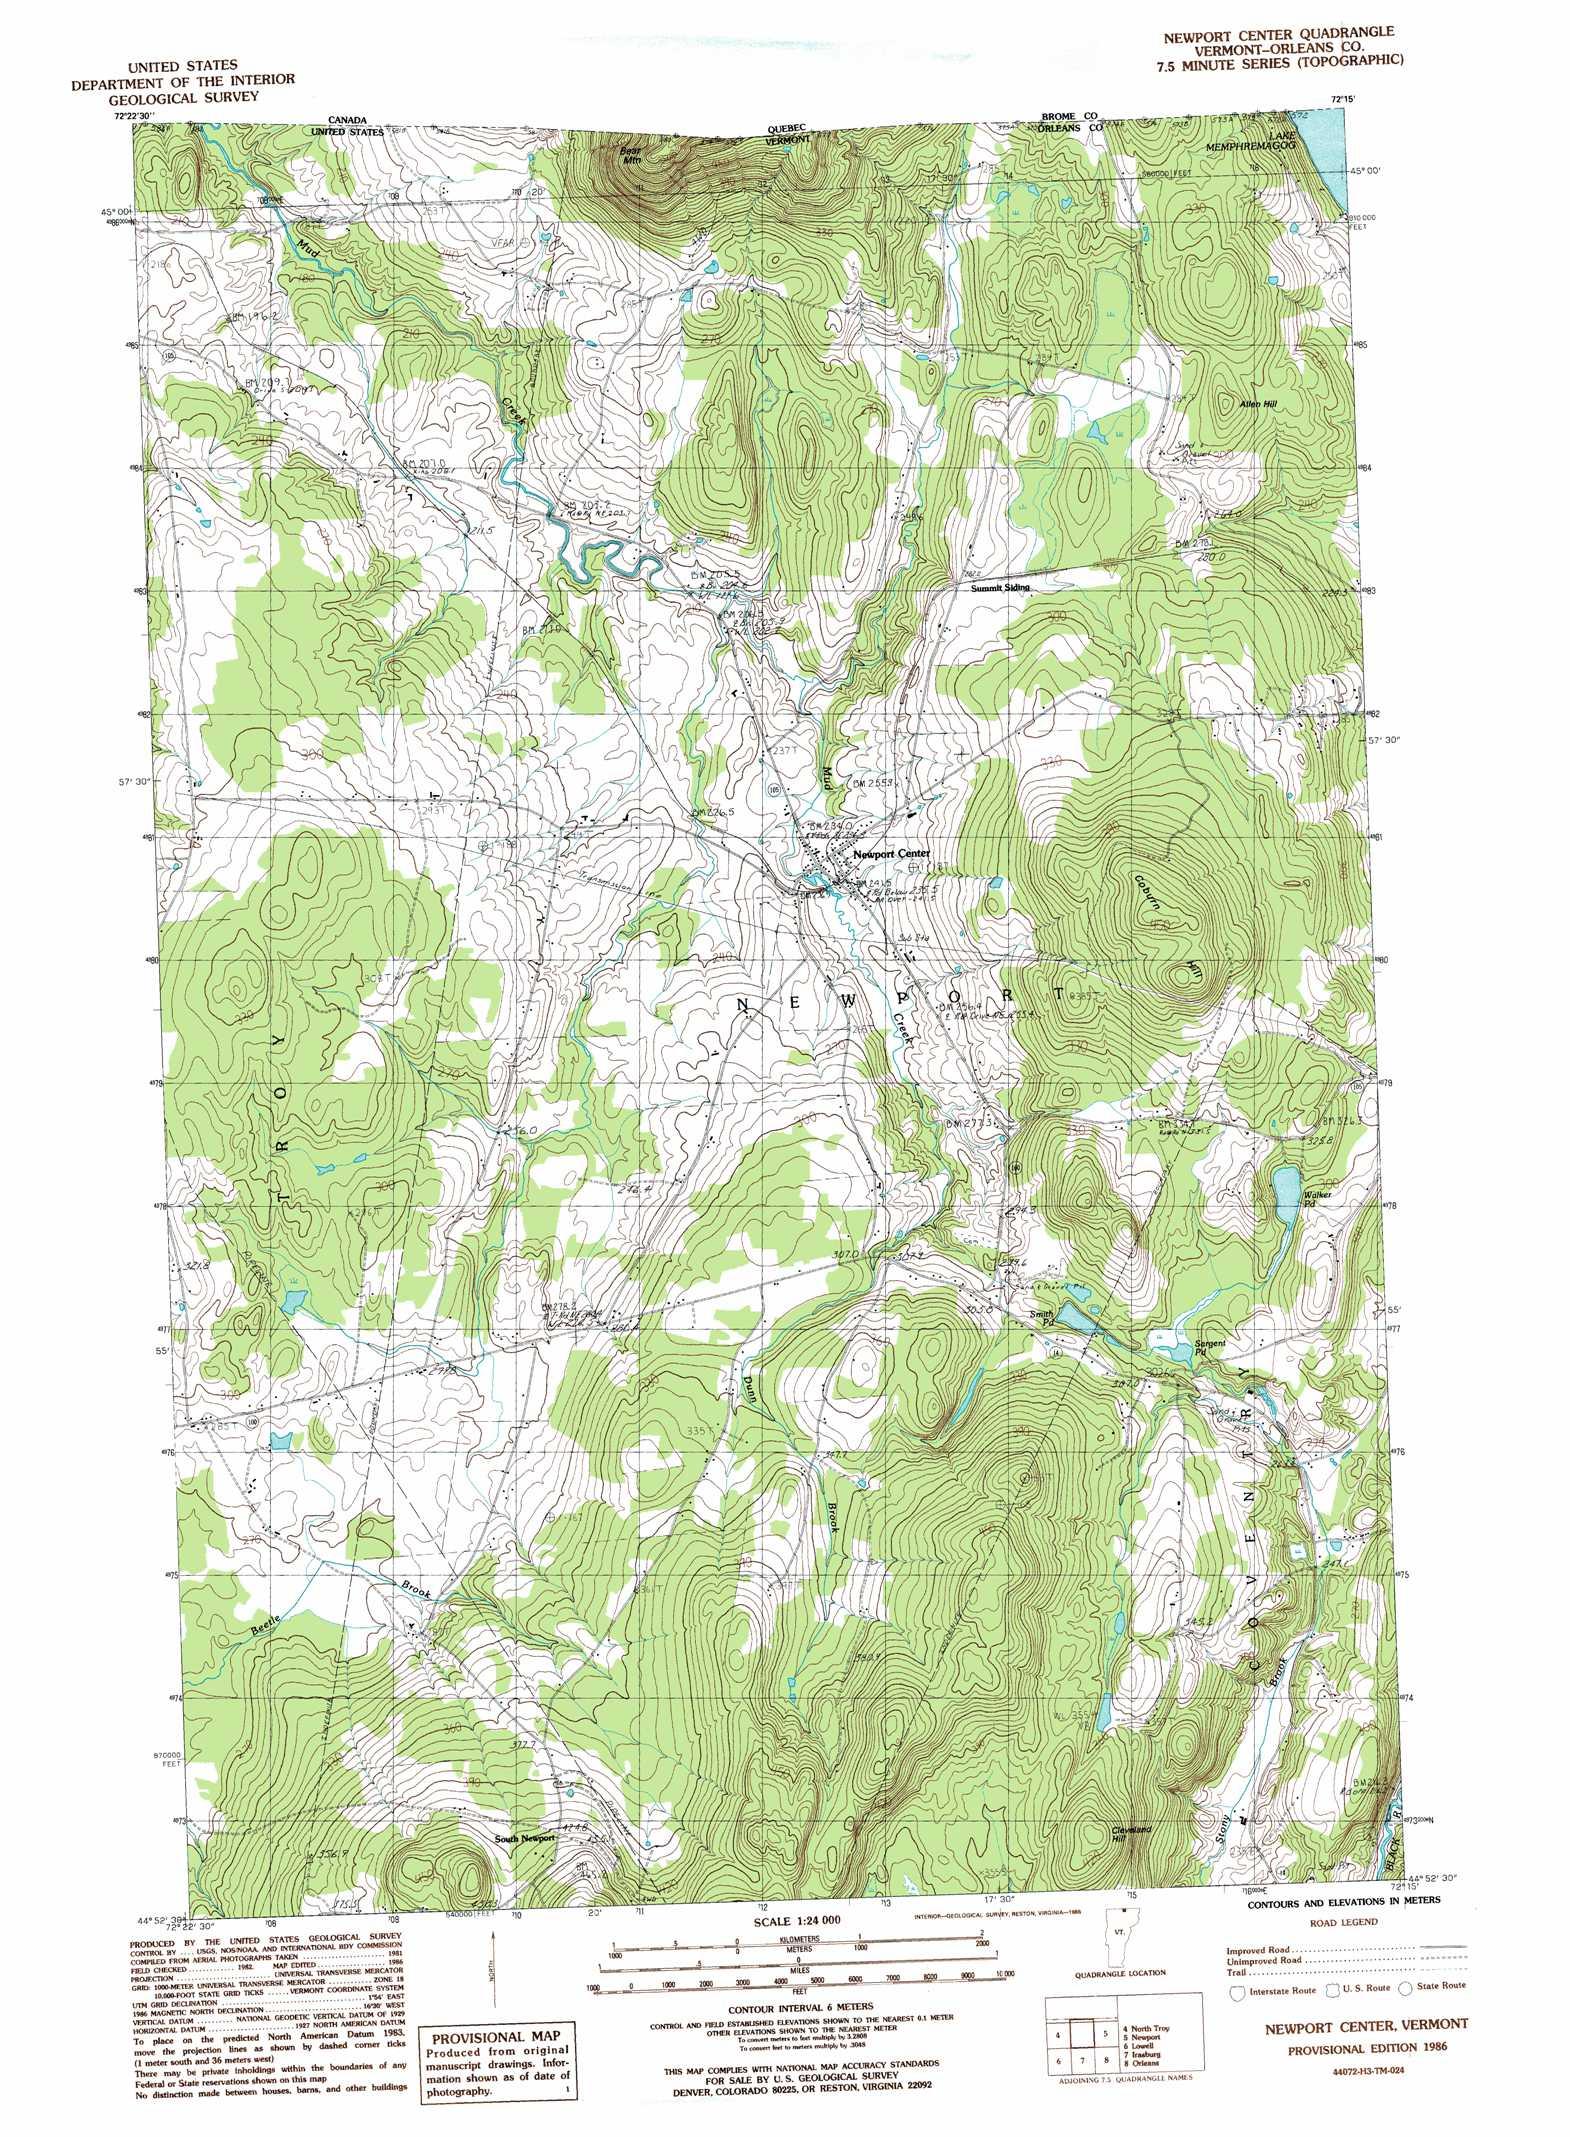 Newport Center topographic map, VT - USGS Topo Quad 44072h3